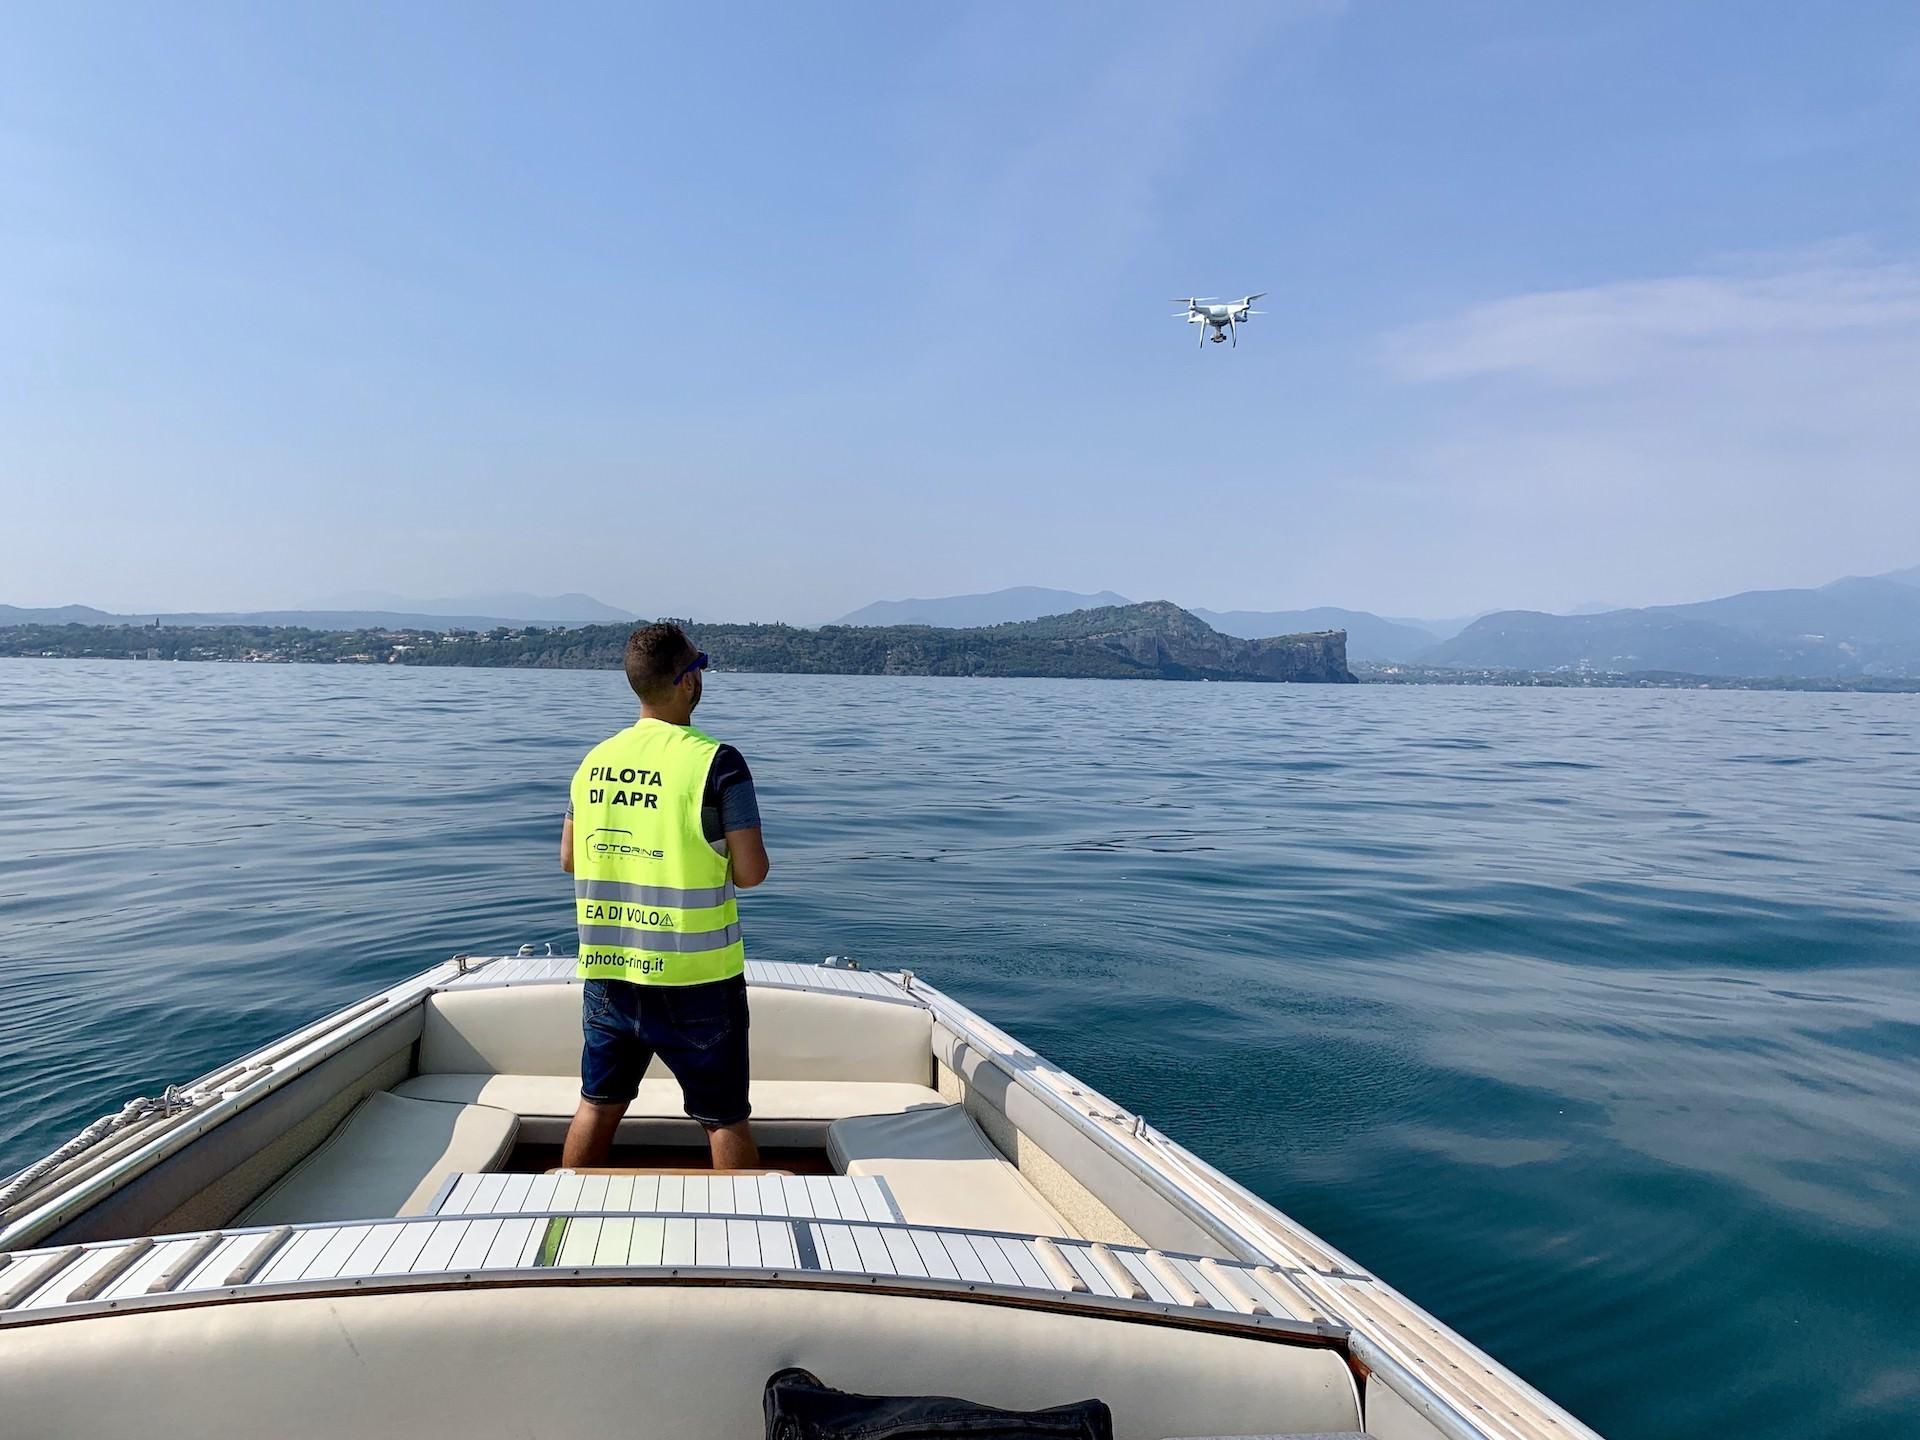 photoring riprese drone lago garda